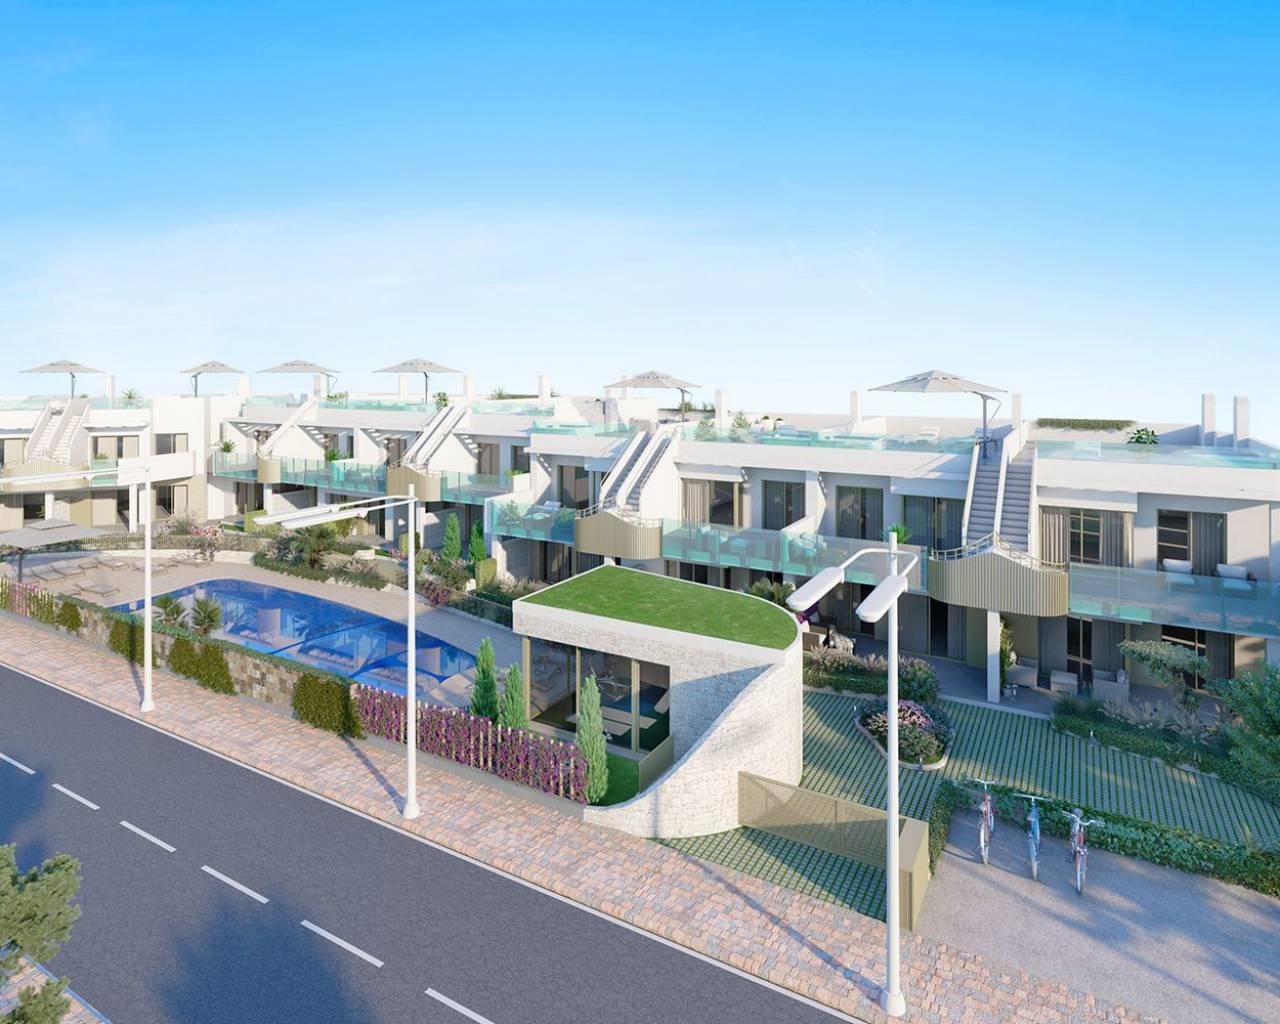 nieuwbouw-appartement-pilar-de-la-horadada_5785_xl